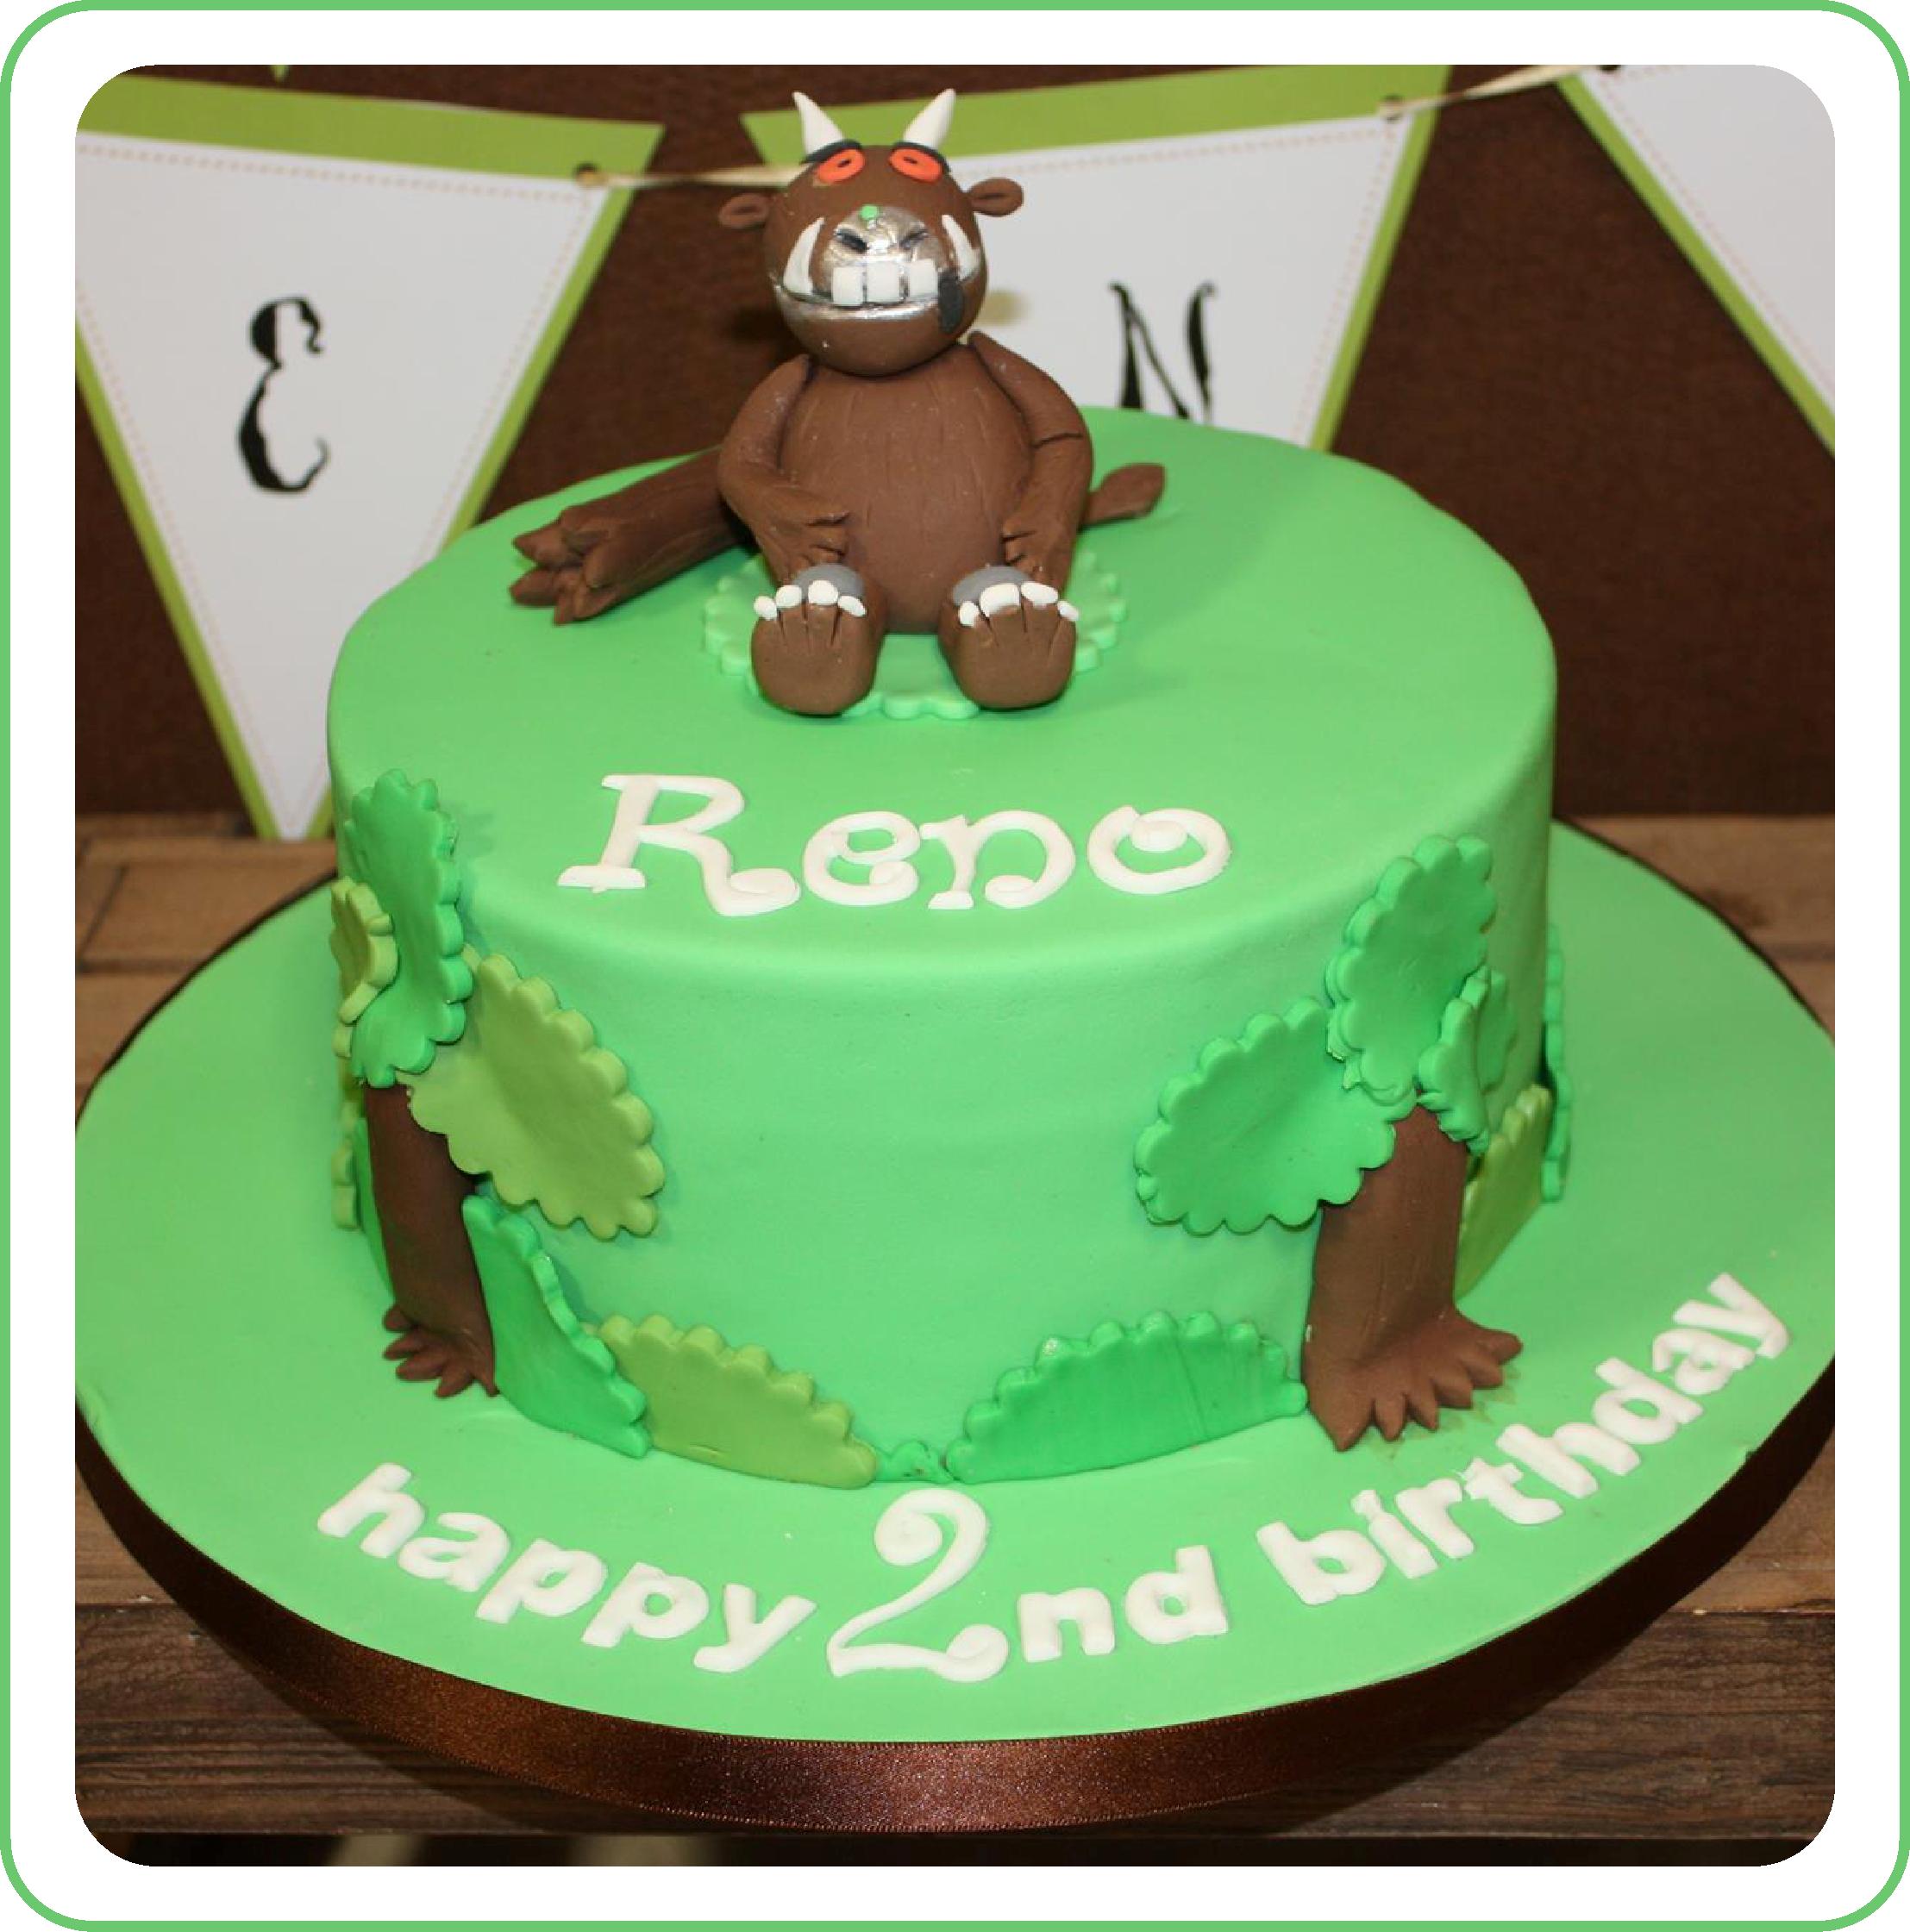 Gruffal Birthday Cake.png